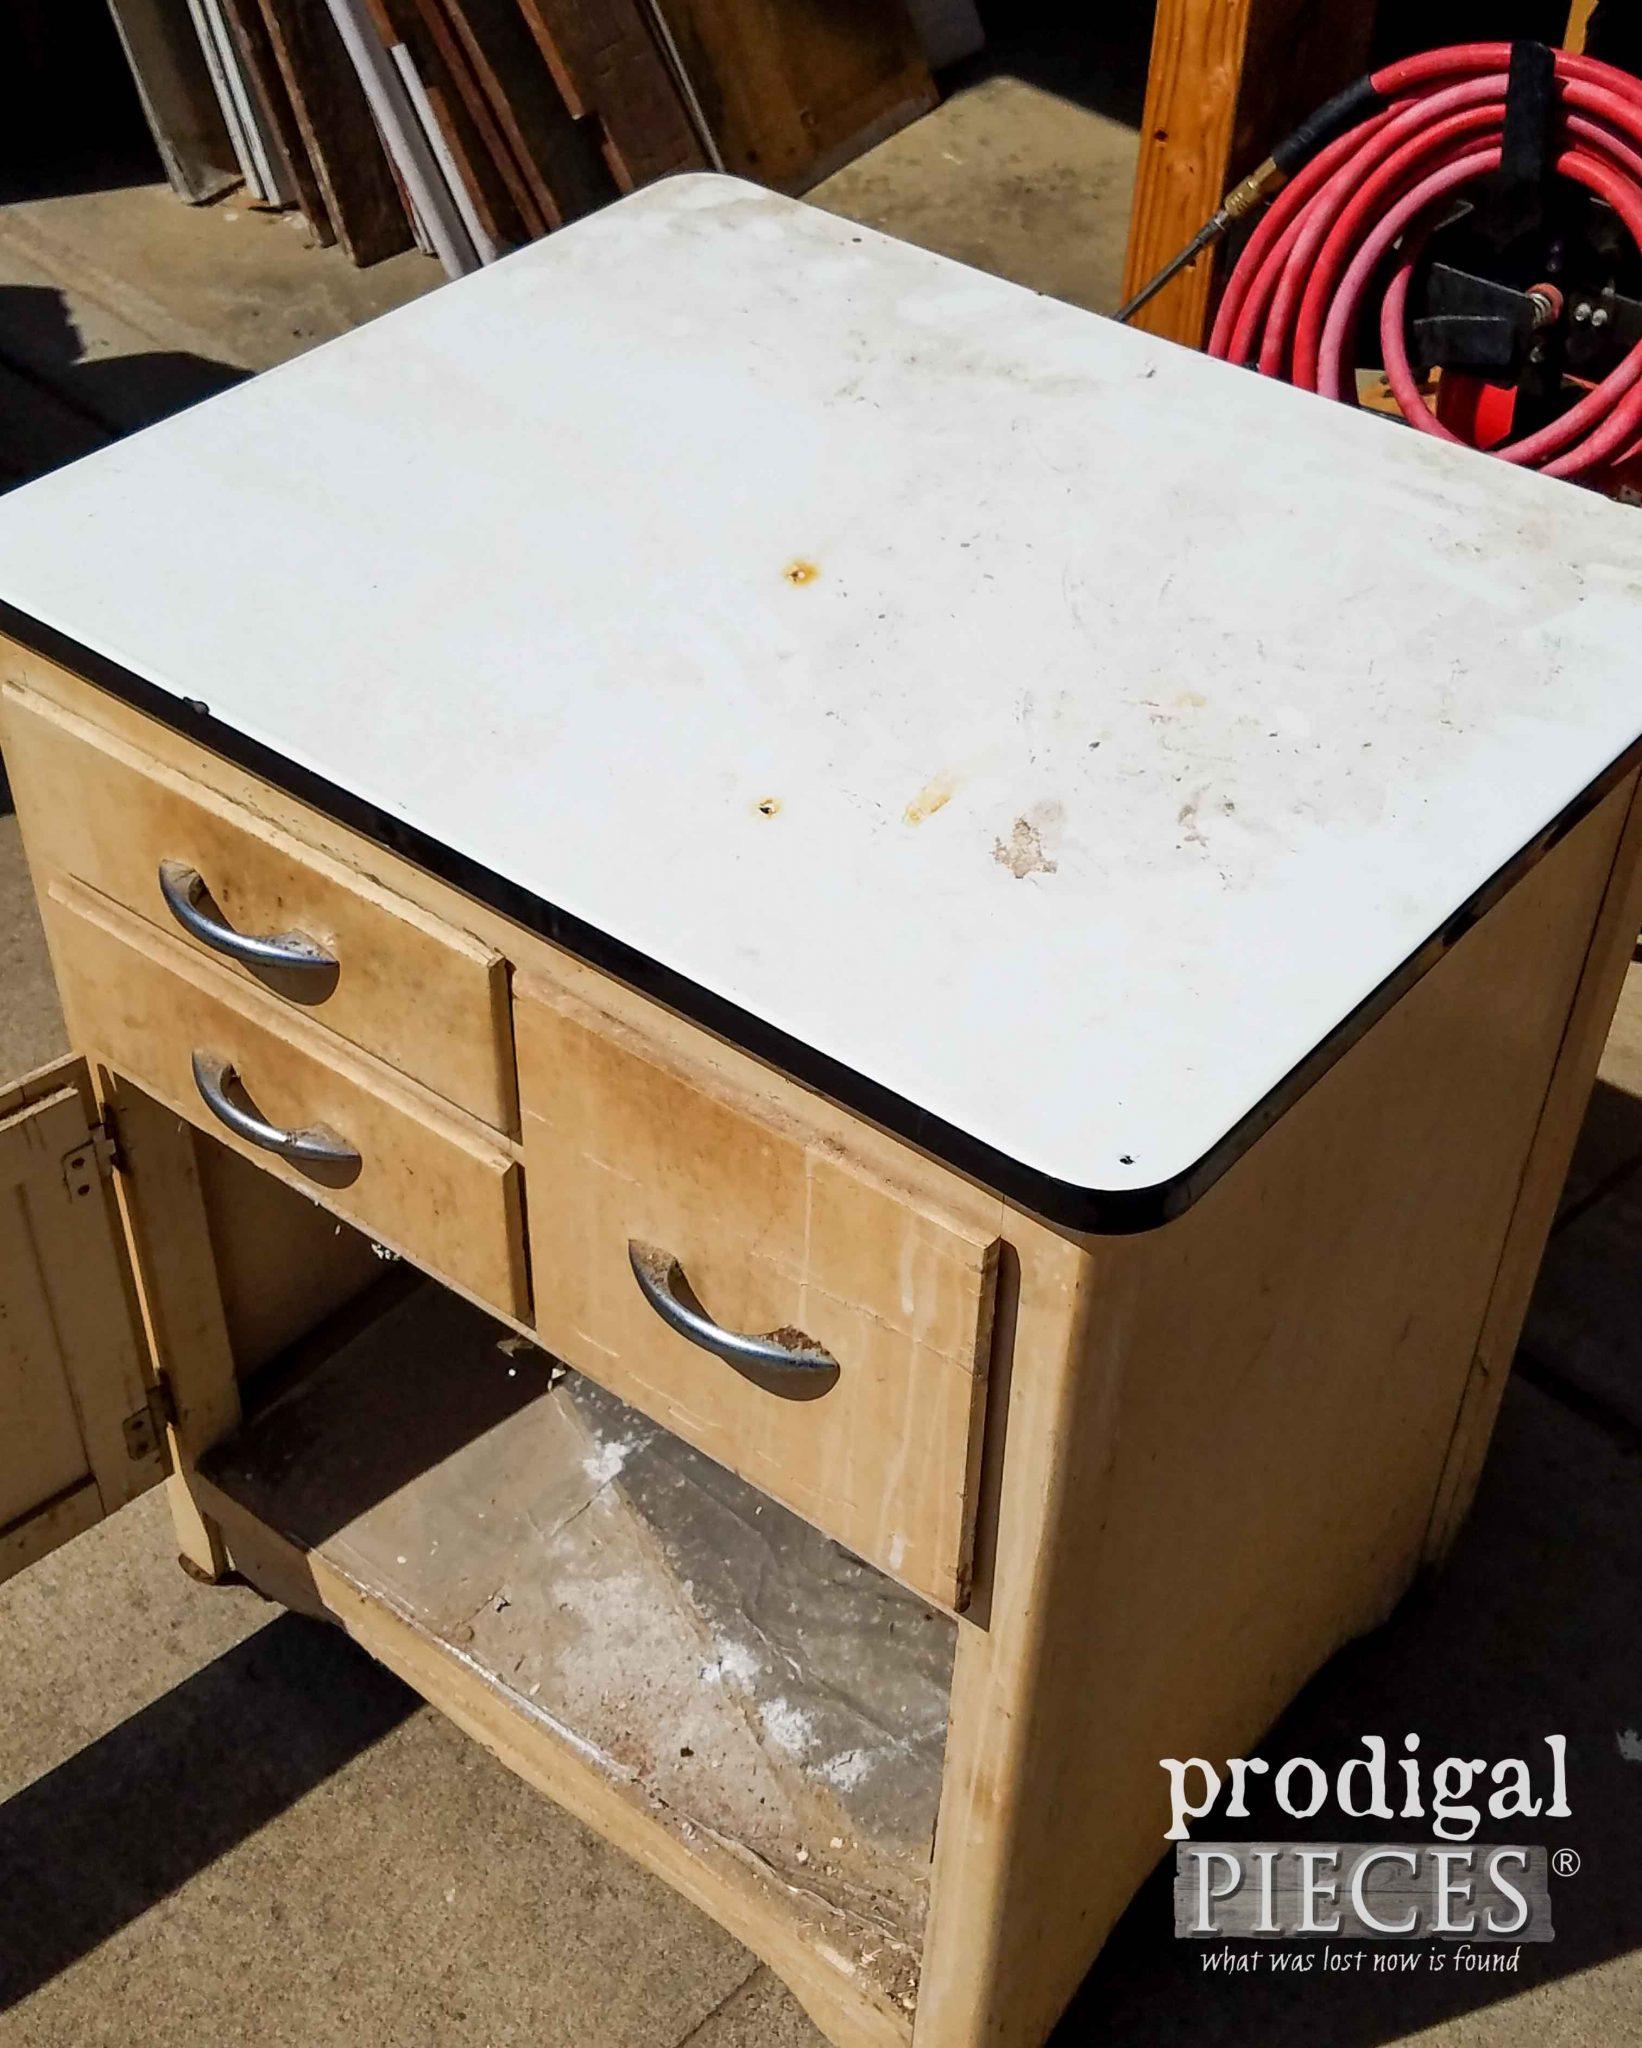 Enamel Top of Cabinet | Prodigal Pieces | prodigalpieces.com